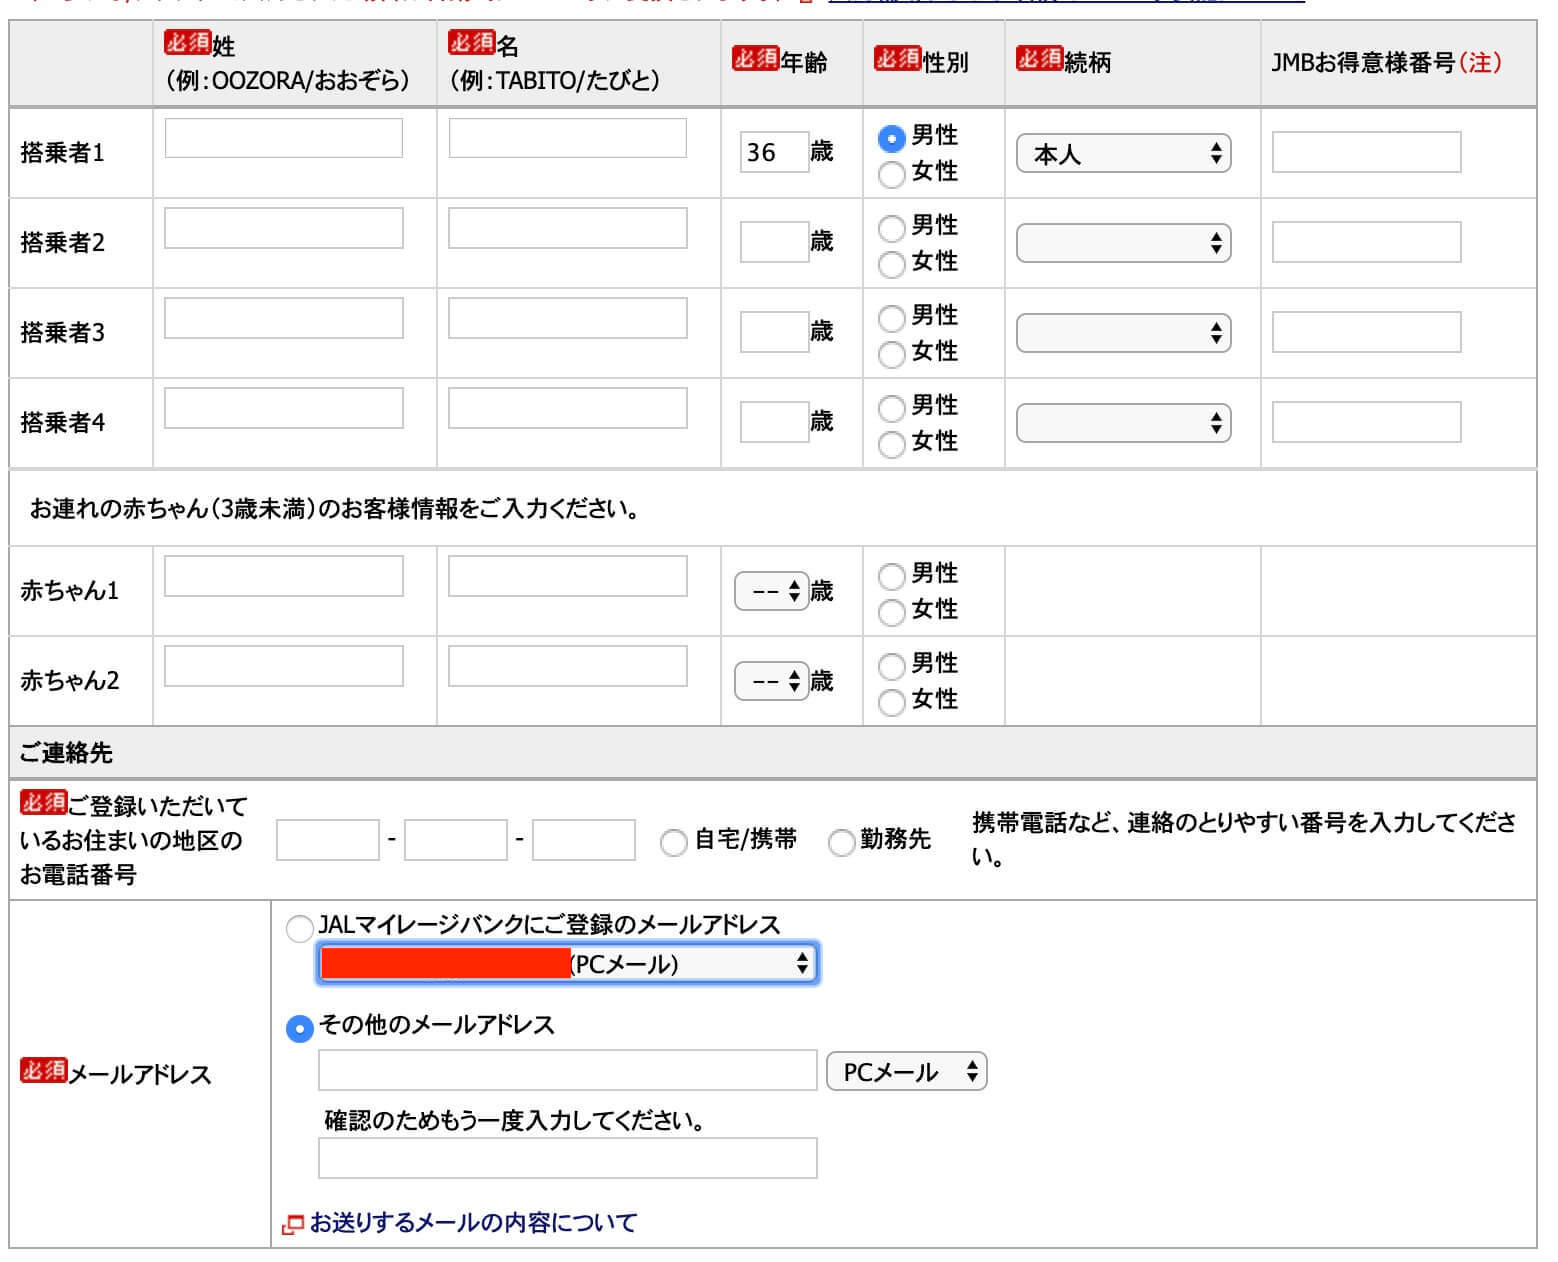 JAL国内航空券予約時の搭乗者情報を入力する